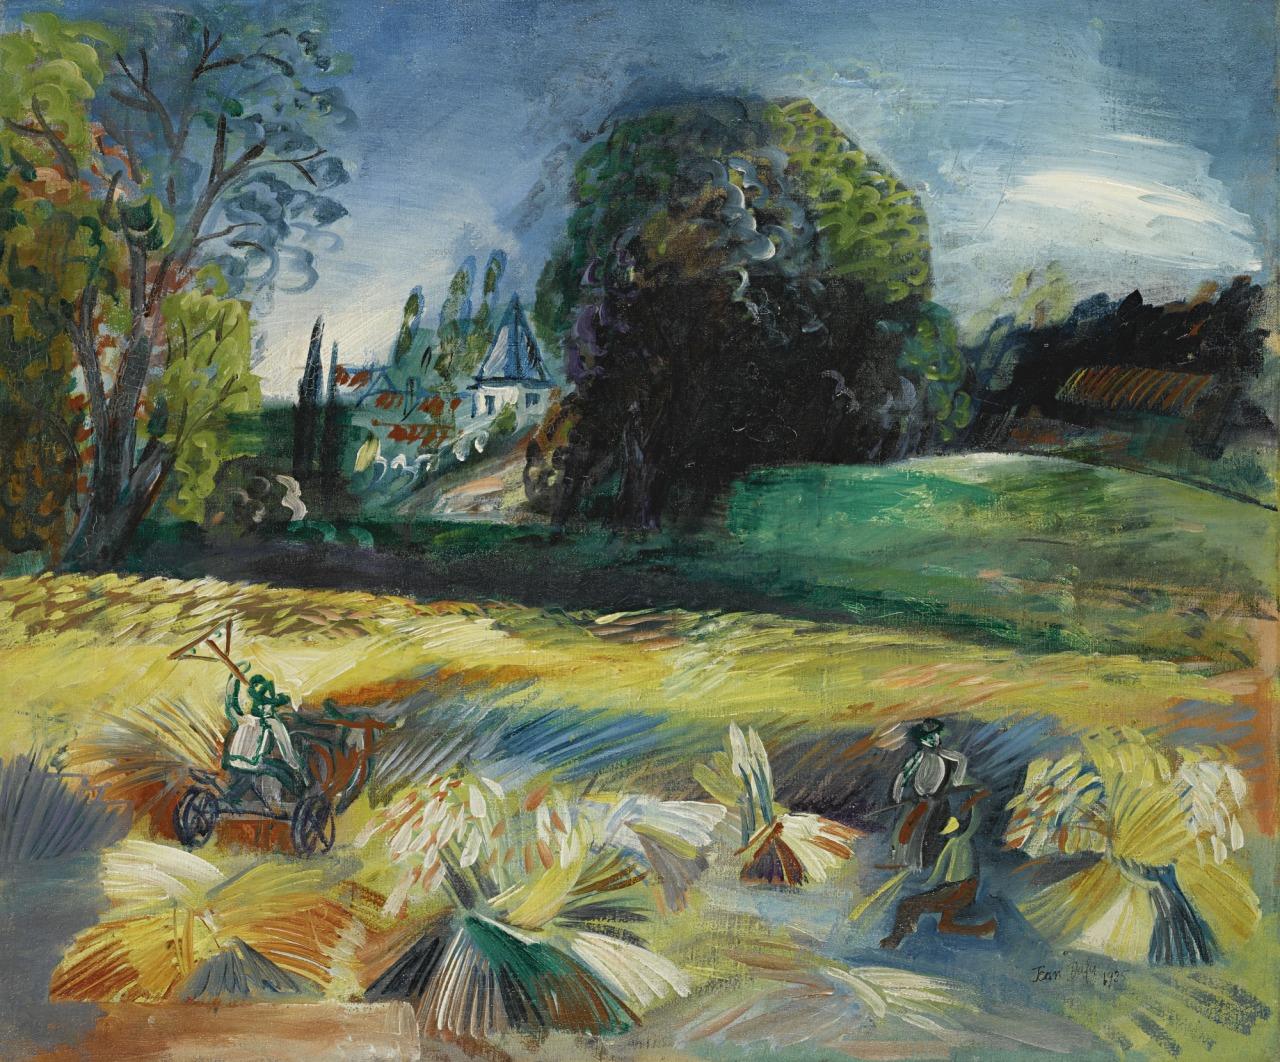 thunderstruck9:  Jean Dufy (French, 1888-1964), La Moisson [The Harvest], 1925. Oil on canvas, 54.5 x 65.5 cm.